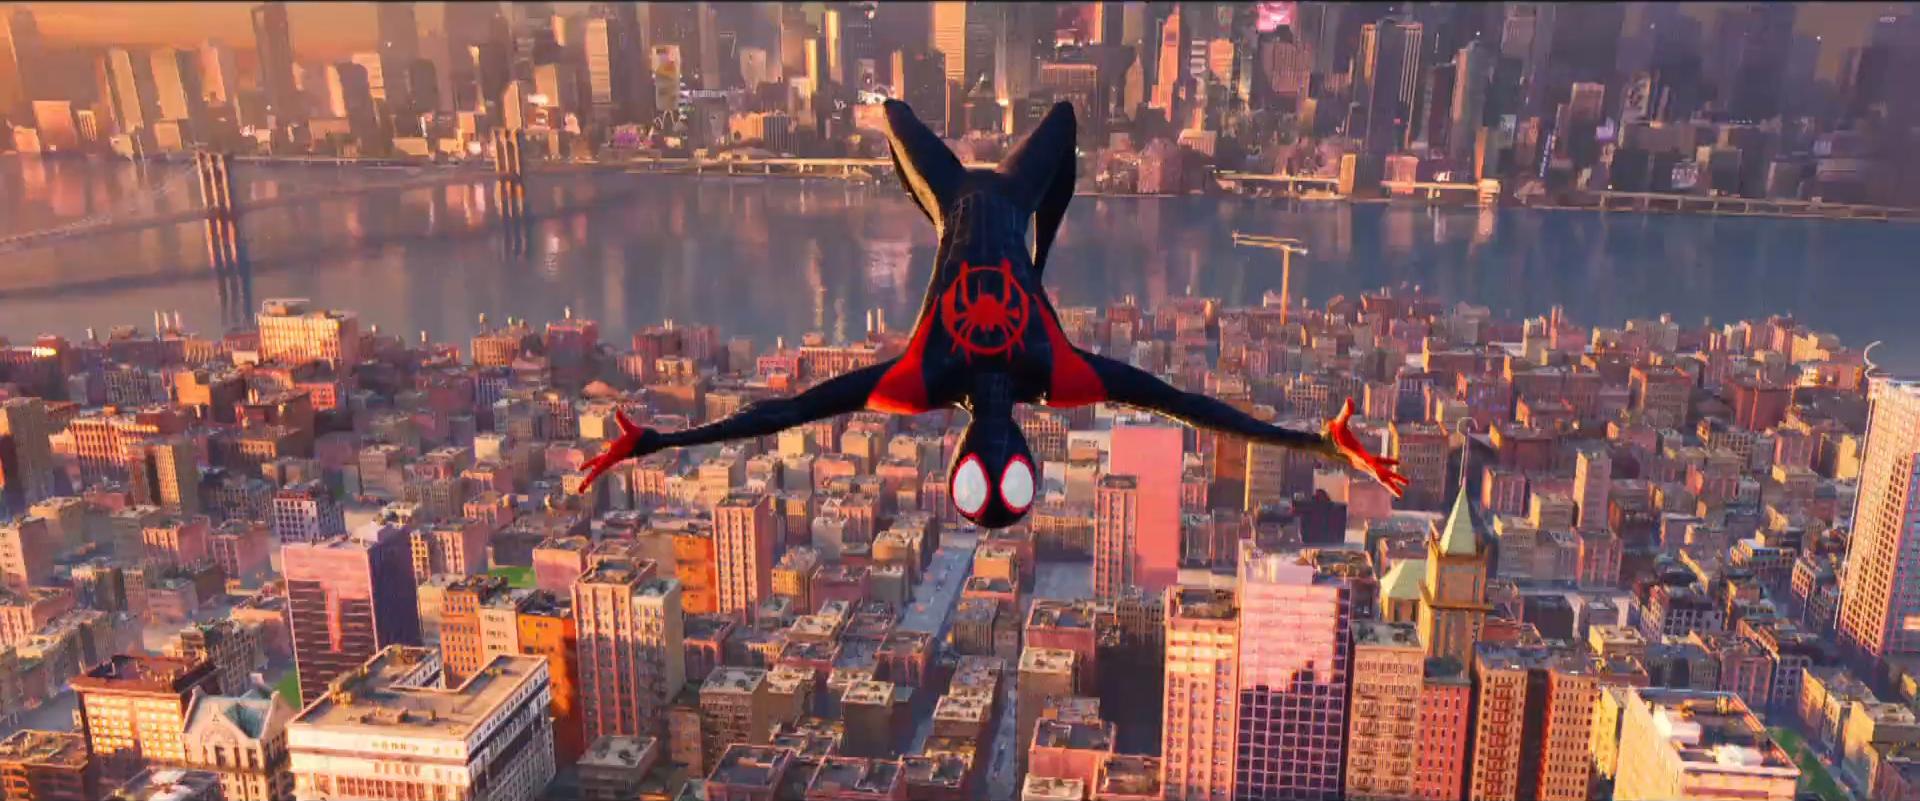 spider-man: miles morales aerial tricks